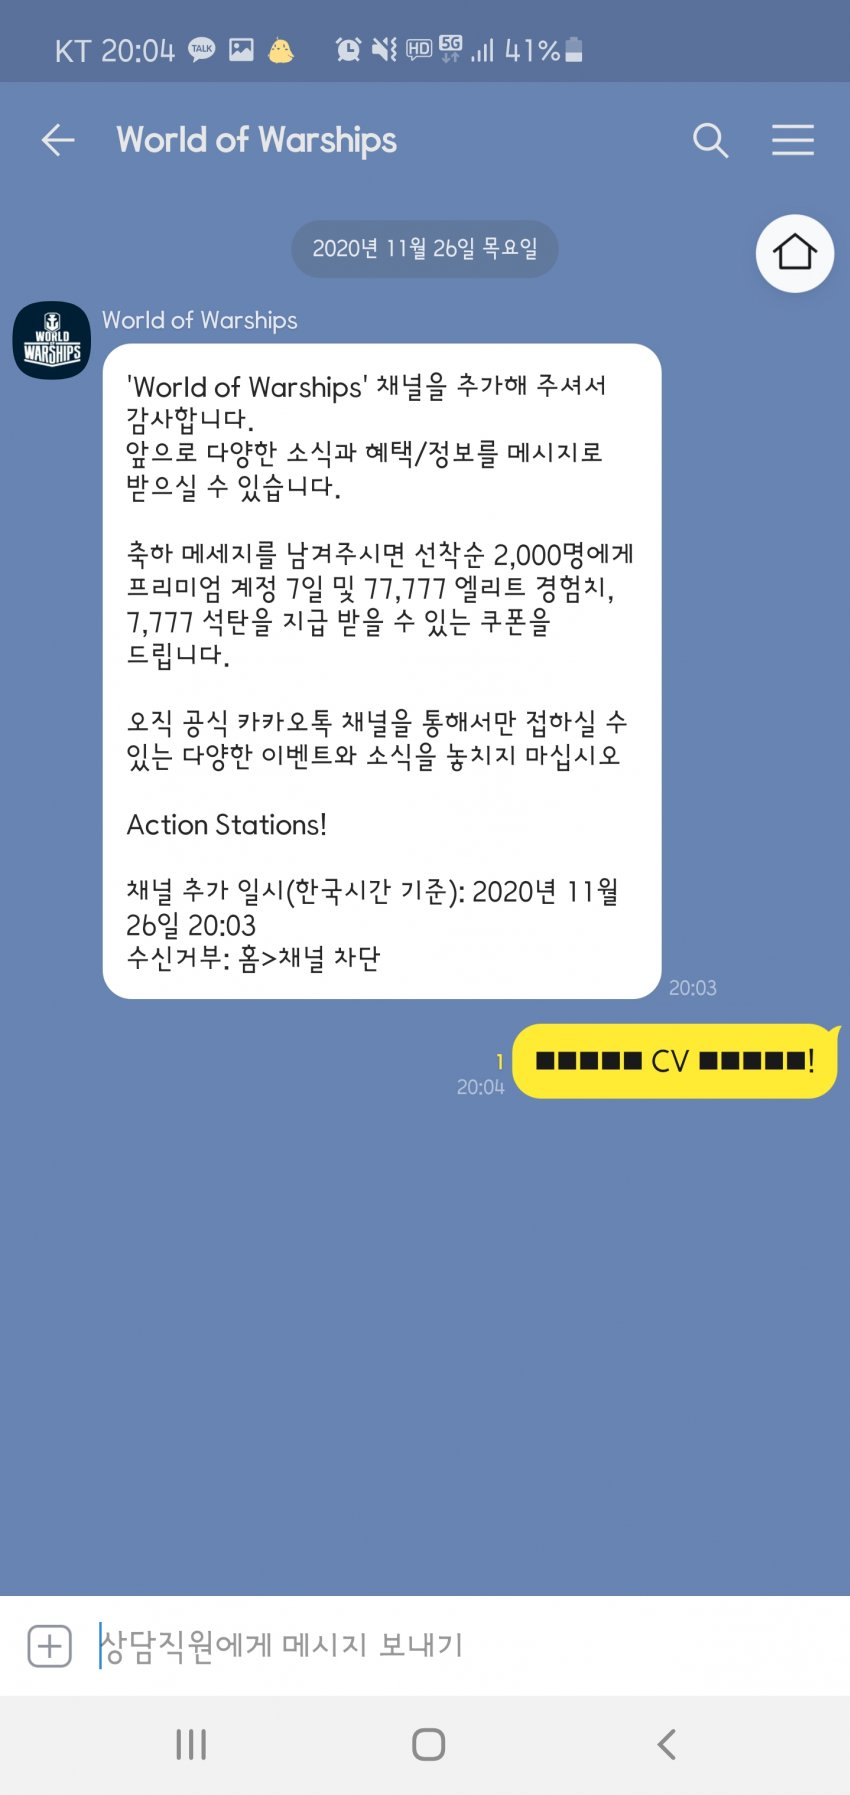 viewimage.php?id=3ab2c735&no=24b0d769e1d32ca73dec84fa11d0283195504478ca9b7677dc322d30cb339b426842075e257059e2af46b7f3ecc6065797f572baa5497b14f216f3bb0ac62e4c2a65900fefb0e38edf85f6c15933d12cd9b8b3fed458c9fec315a984d5df355a766b6944